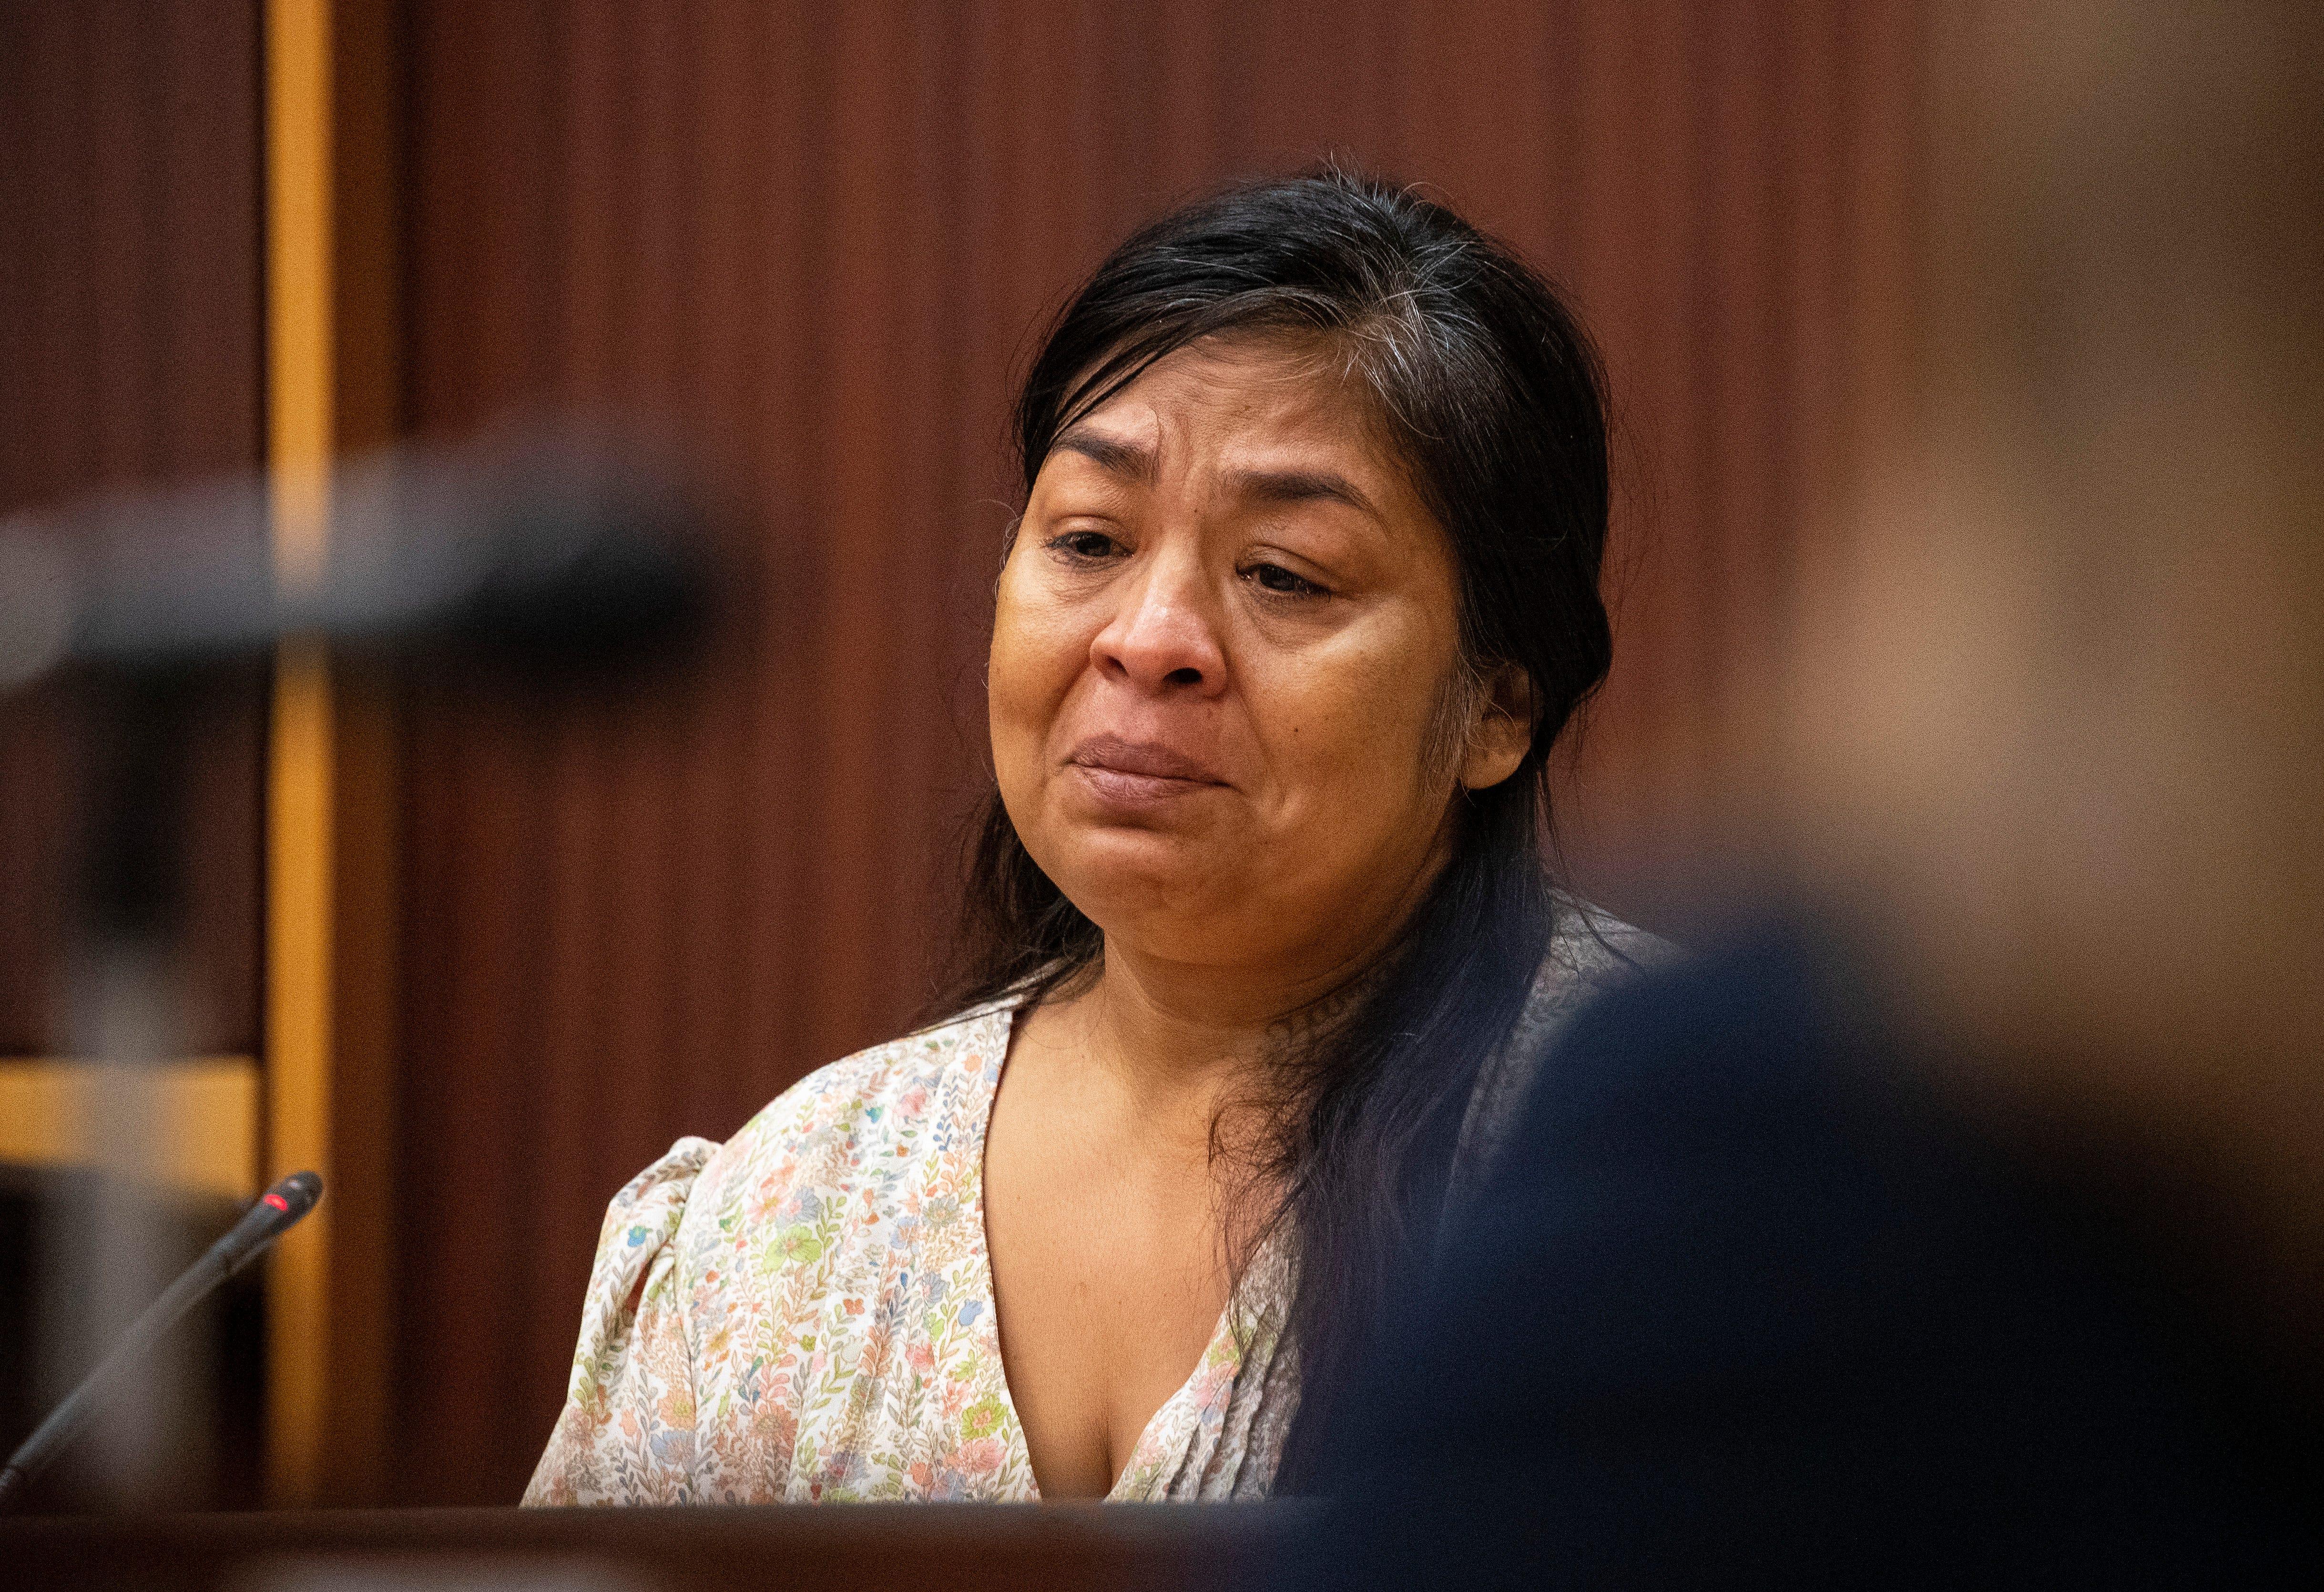 Joyce Cara Zamago appears in court for motions hearing in her case